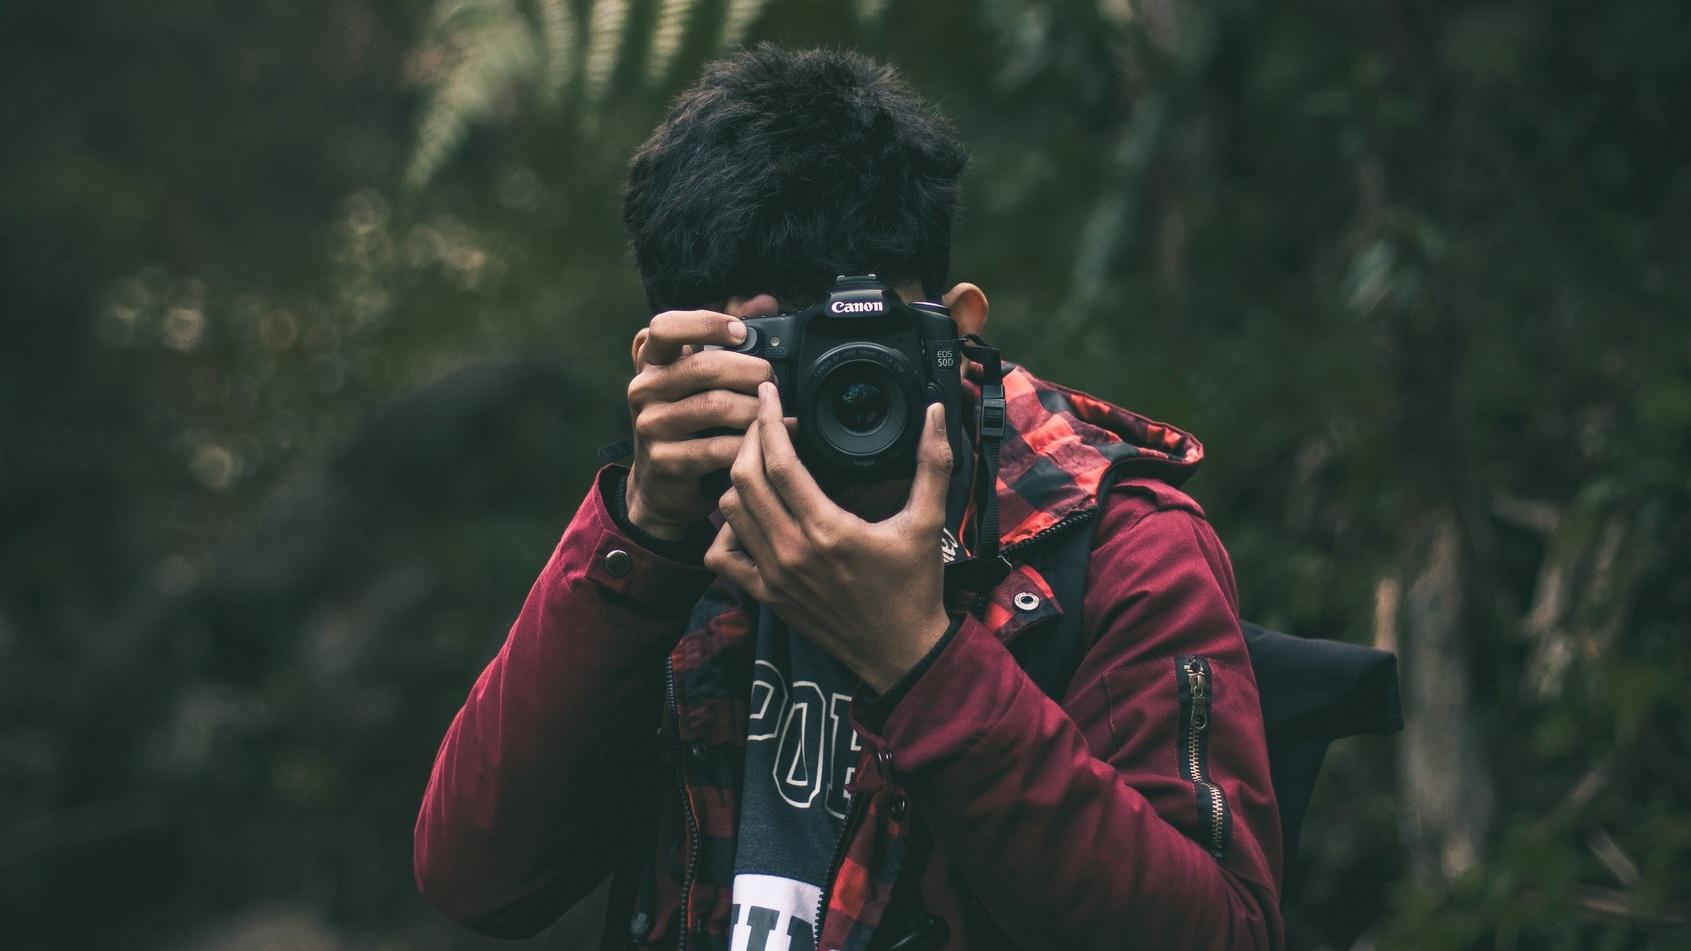 adult-blur-camera-1567730.jpg